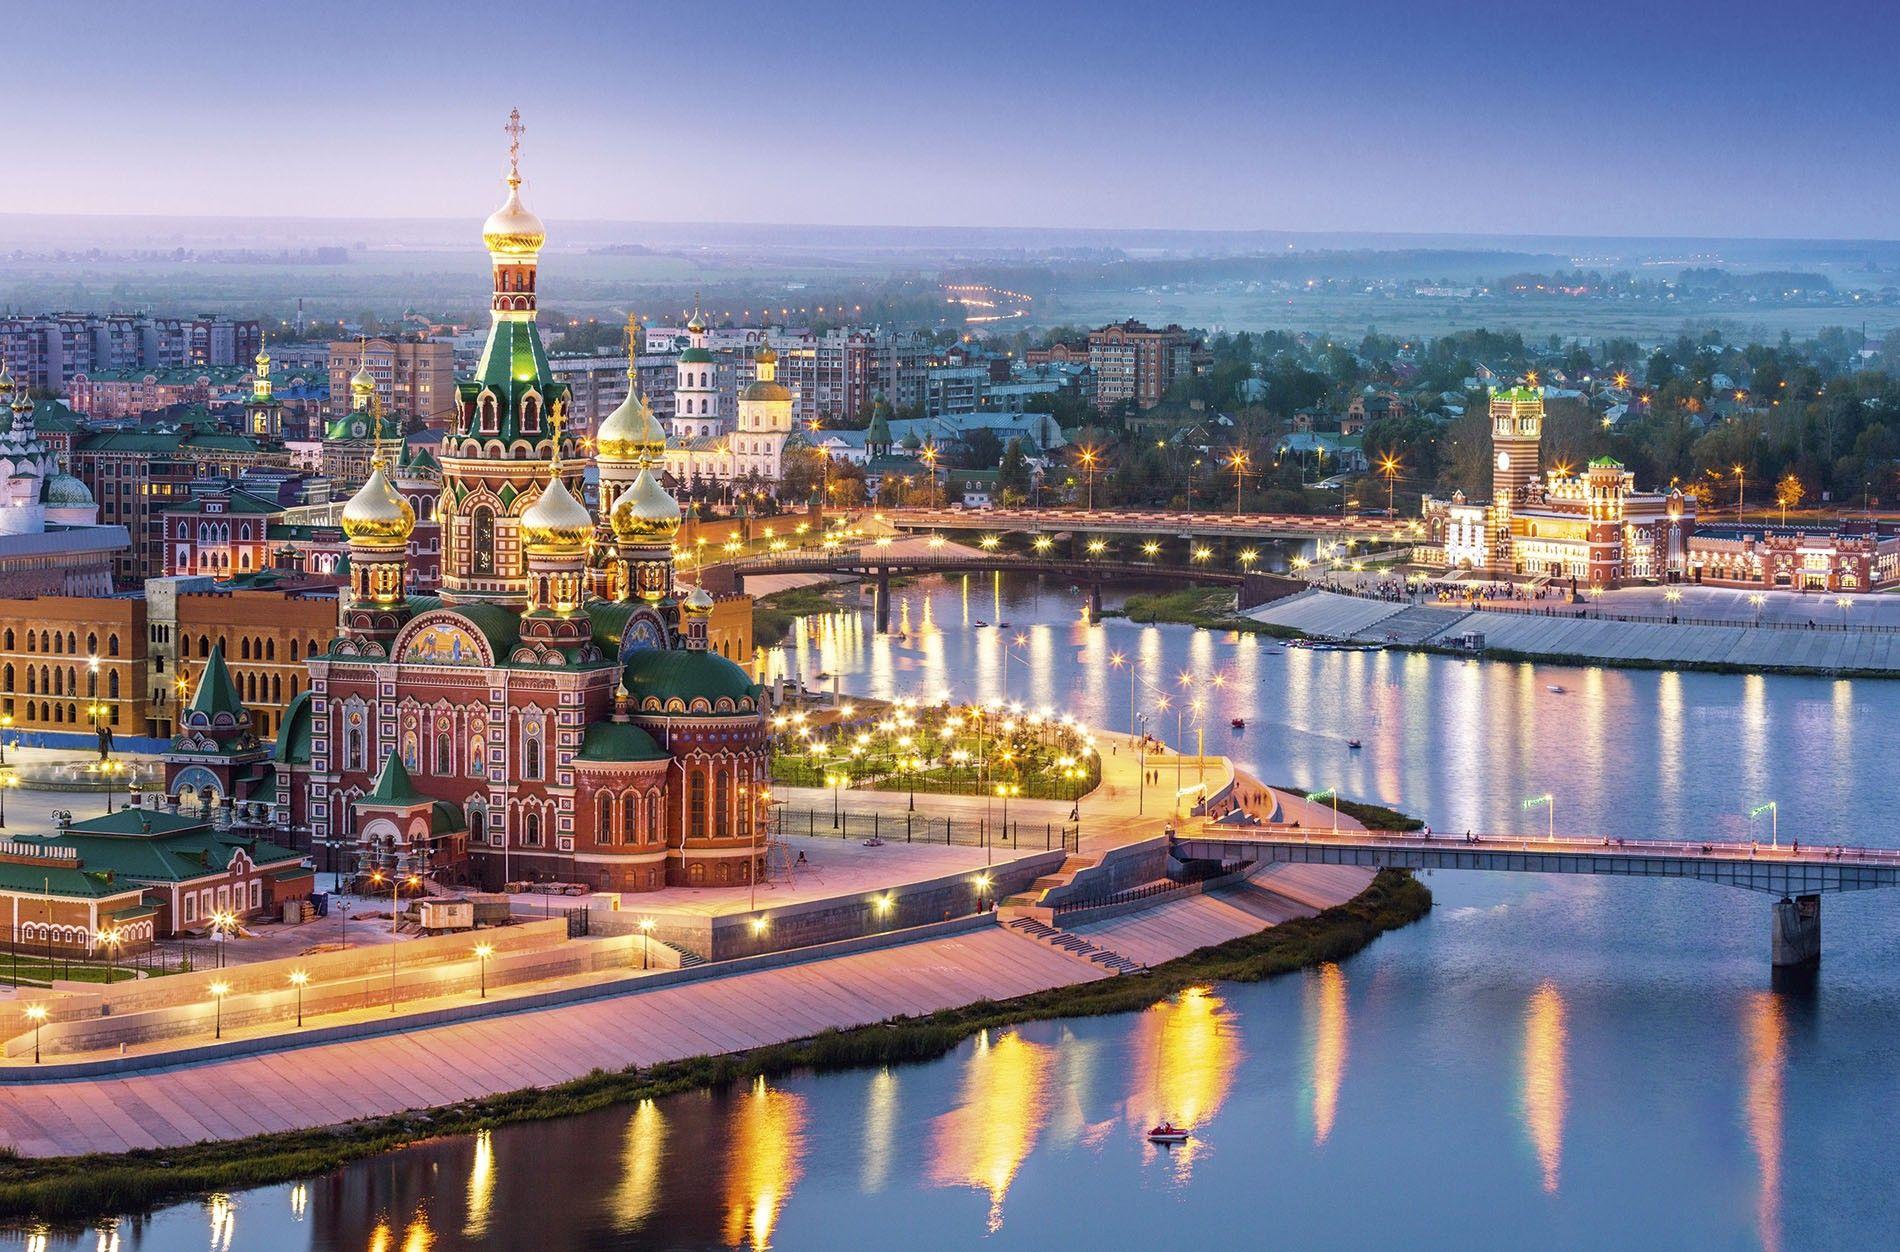 The downtown area of Yoshkar-Ola in the Volga region.